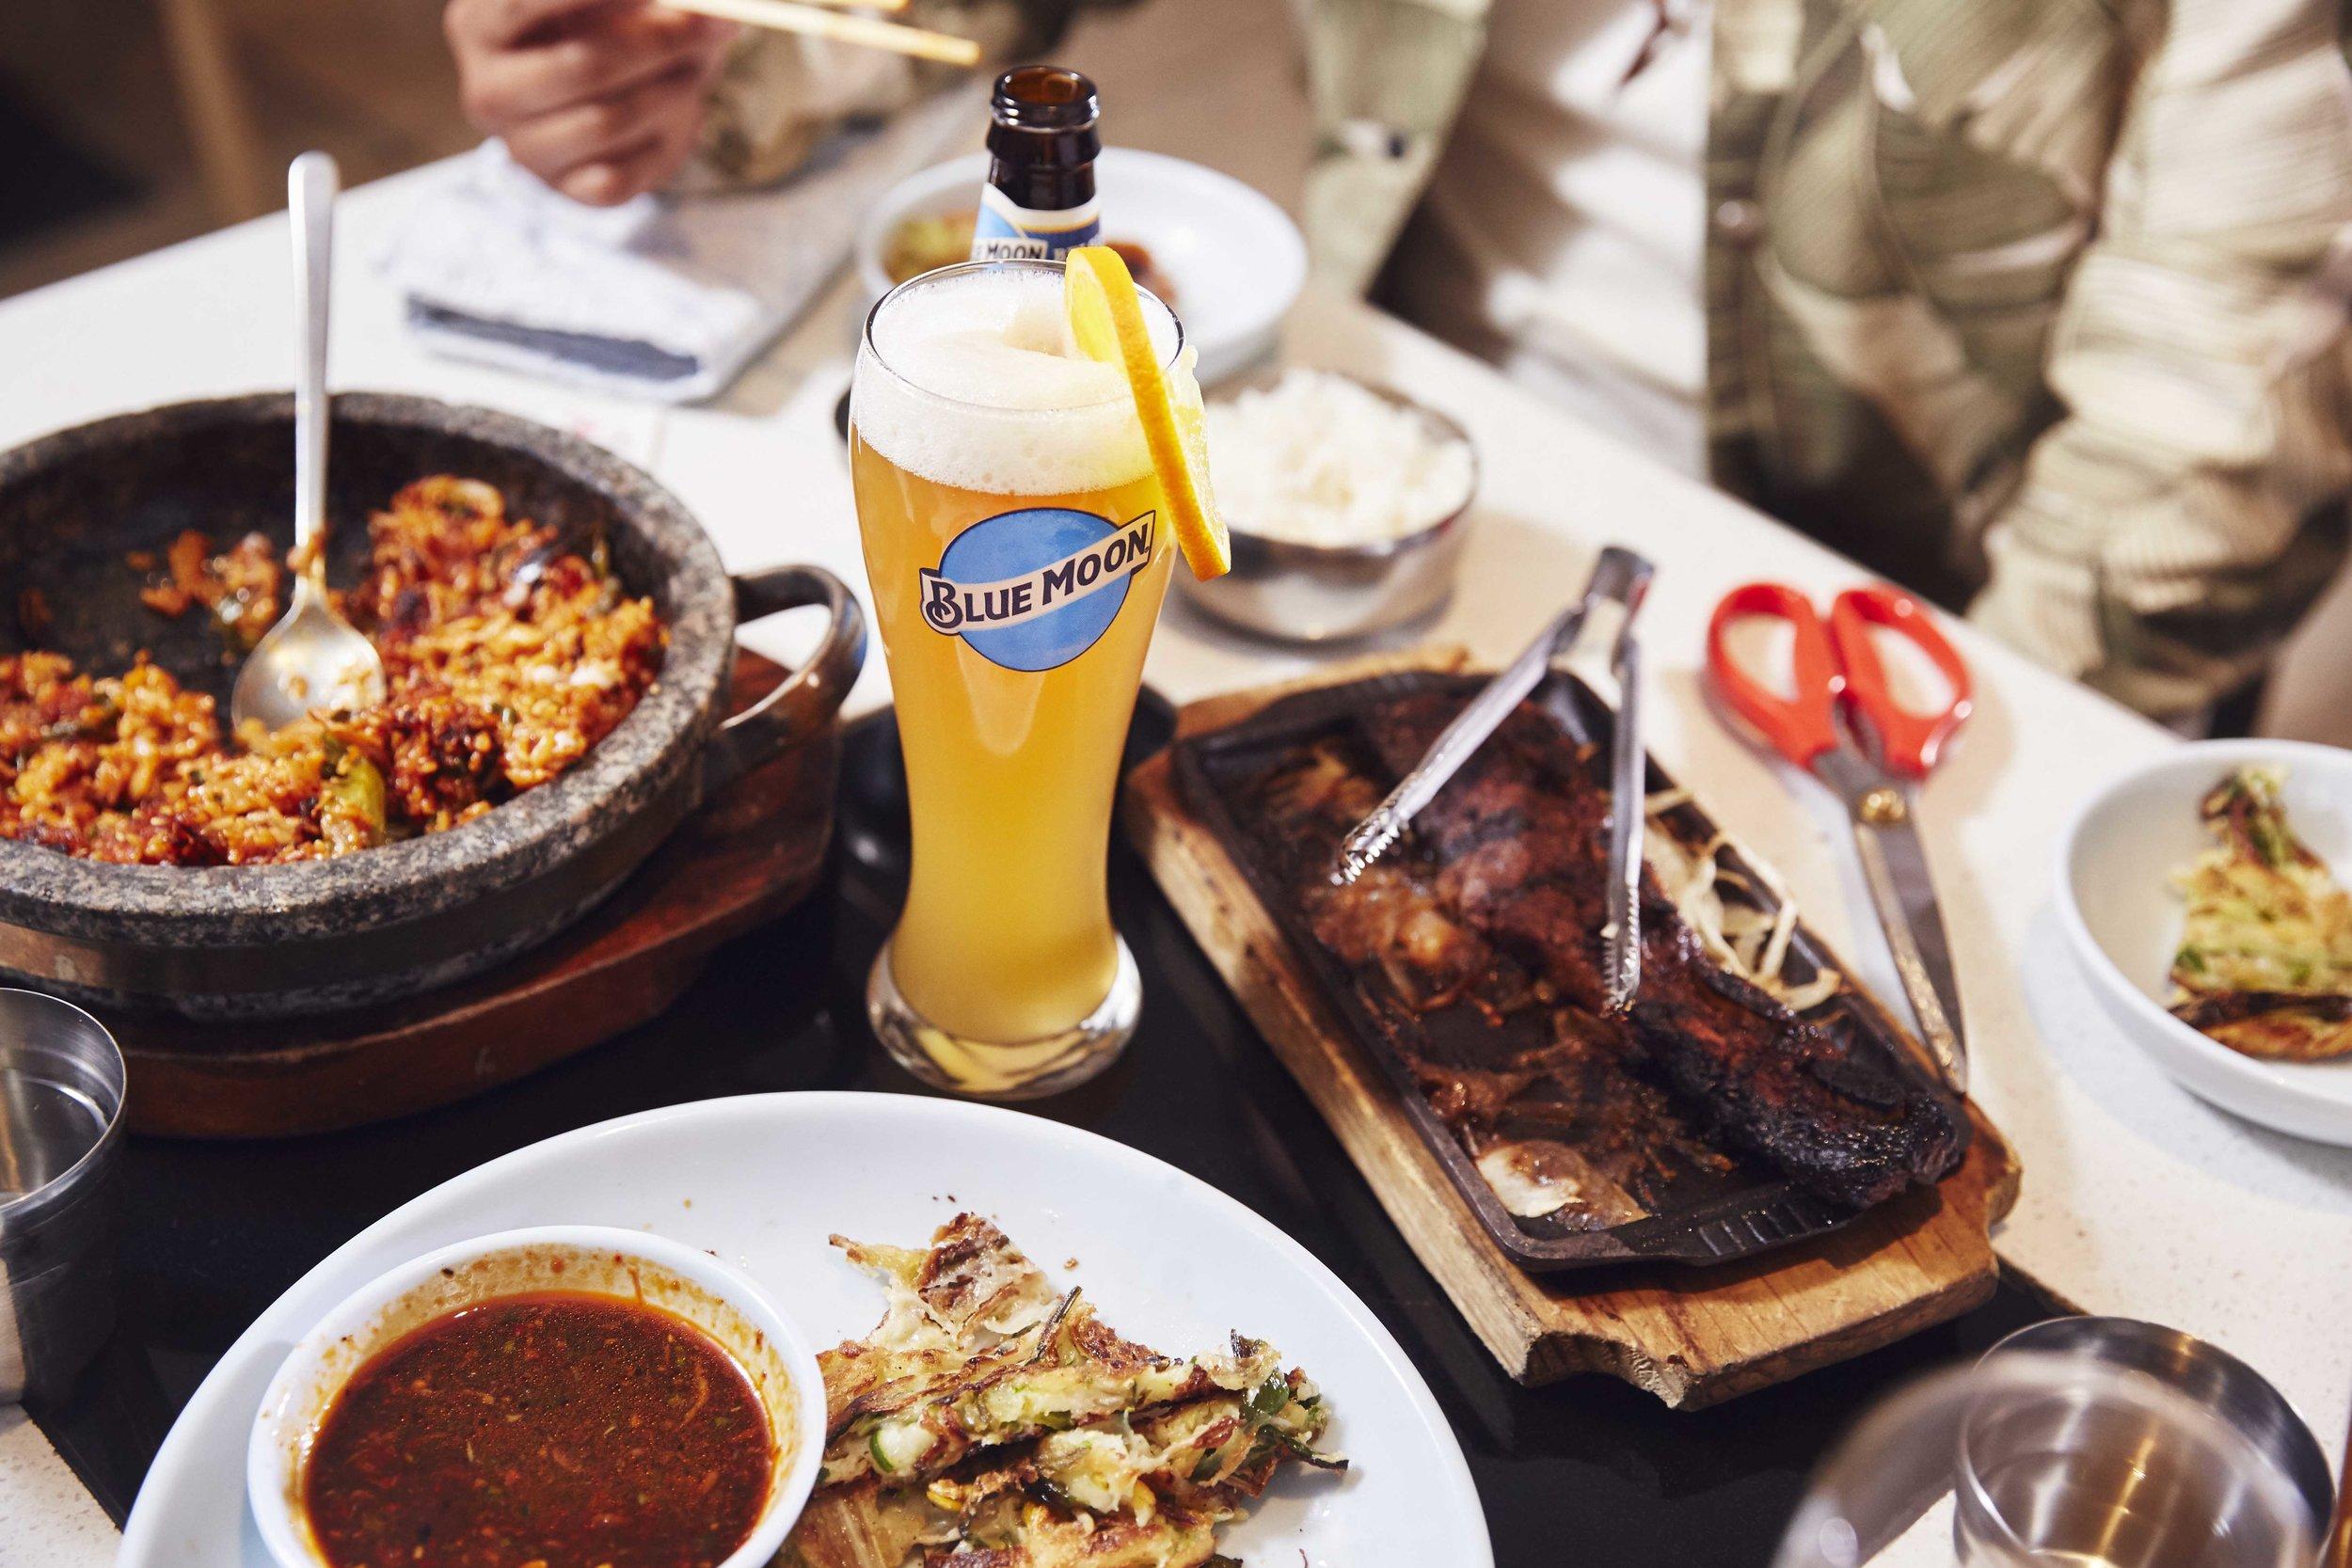 bluemoon-restaurant-5641.jpg